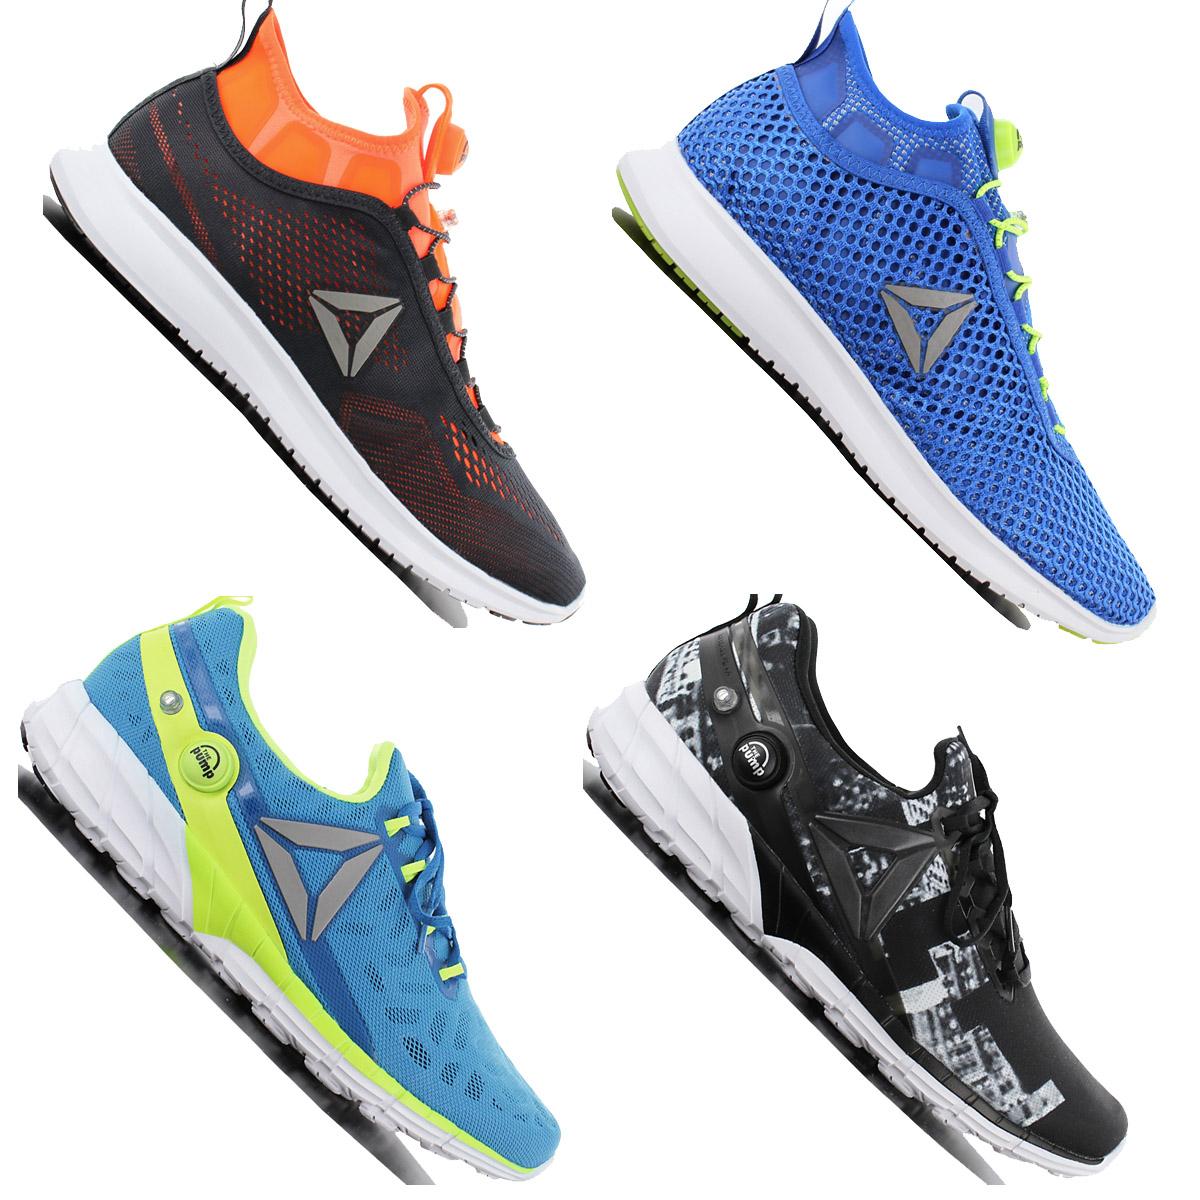 Reebok Pump Supreme Style Herren Premium Sneaker CN2482 Laufschuhe Sportschuhe